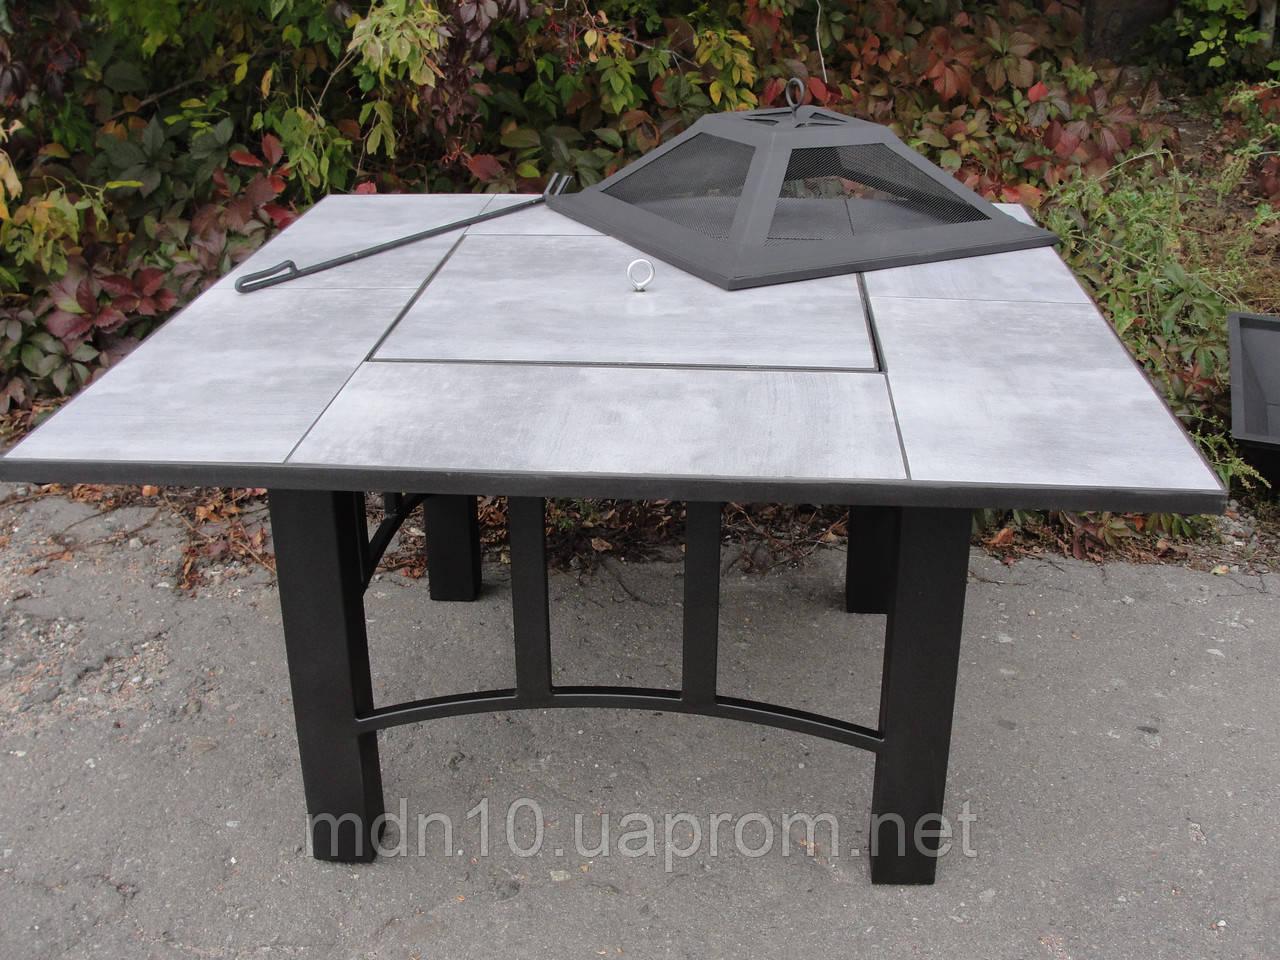 Садовый стол-барбекю 120см (1200x1200х650 мм)